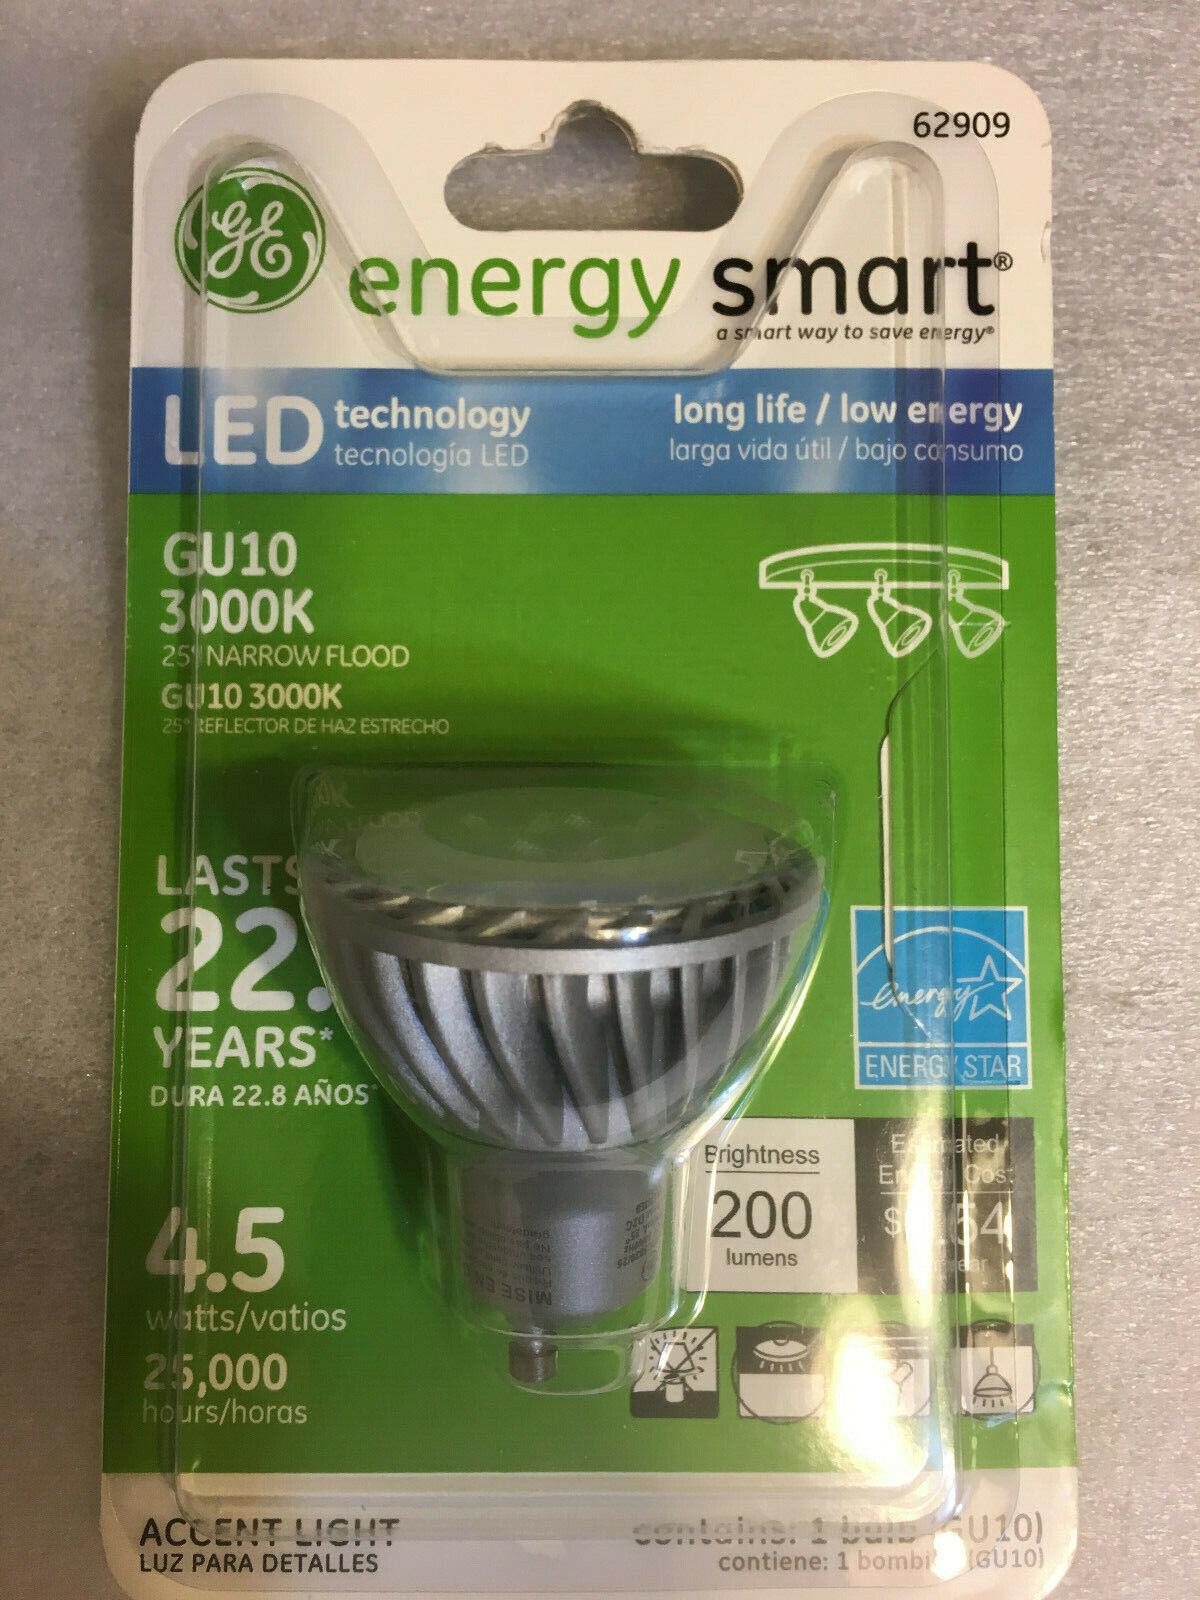 Details about Genuine-GE-Energy-Smart-LED-GU10 Narrow Flood-6-watt ...